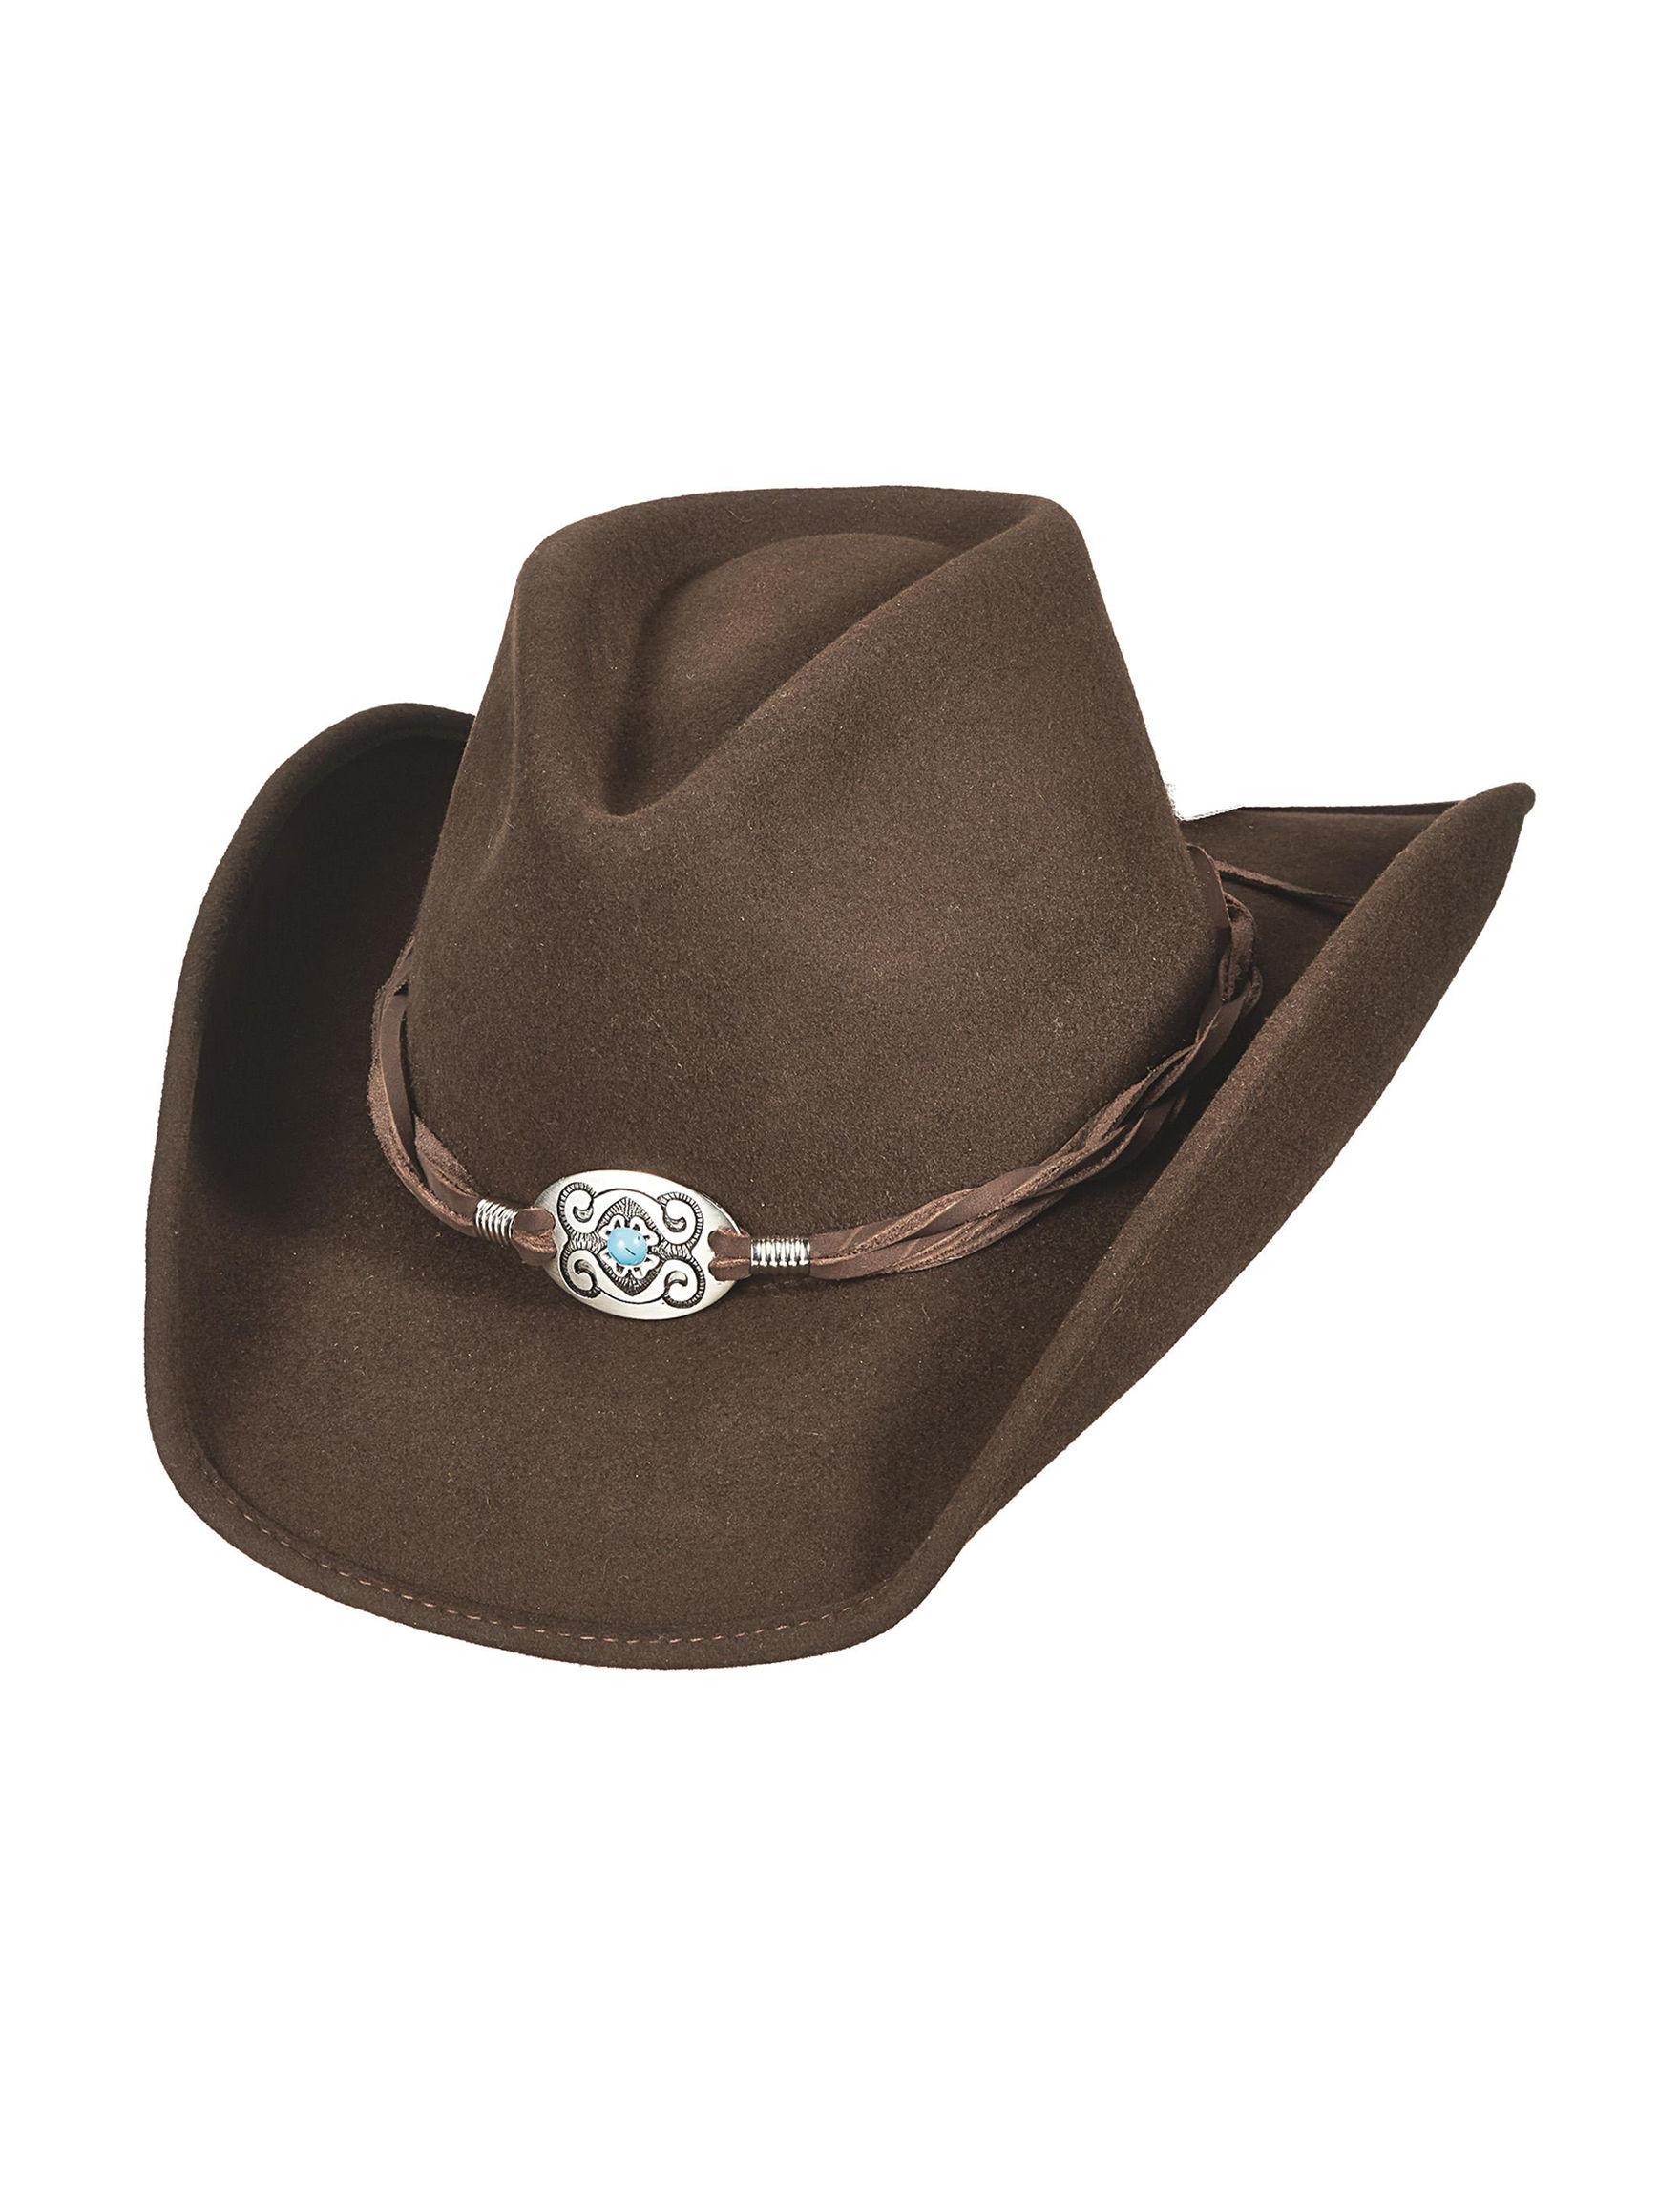 Scala Chocolate Hats & Headwear